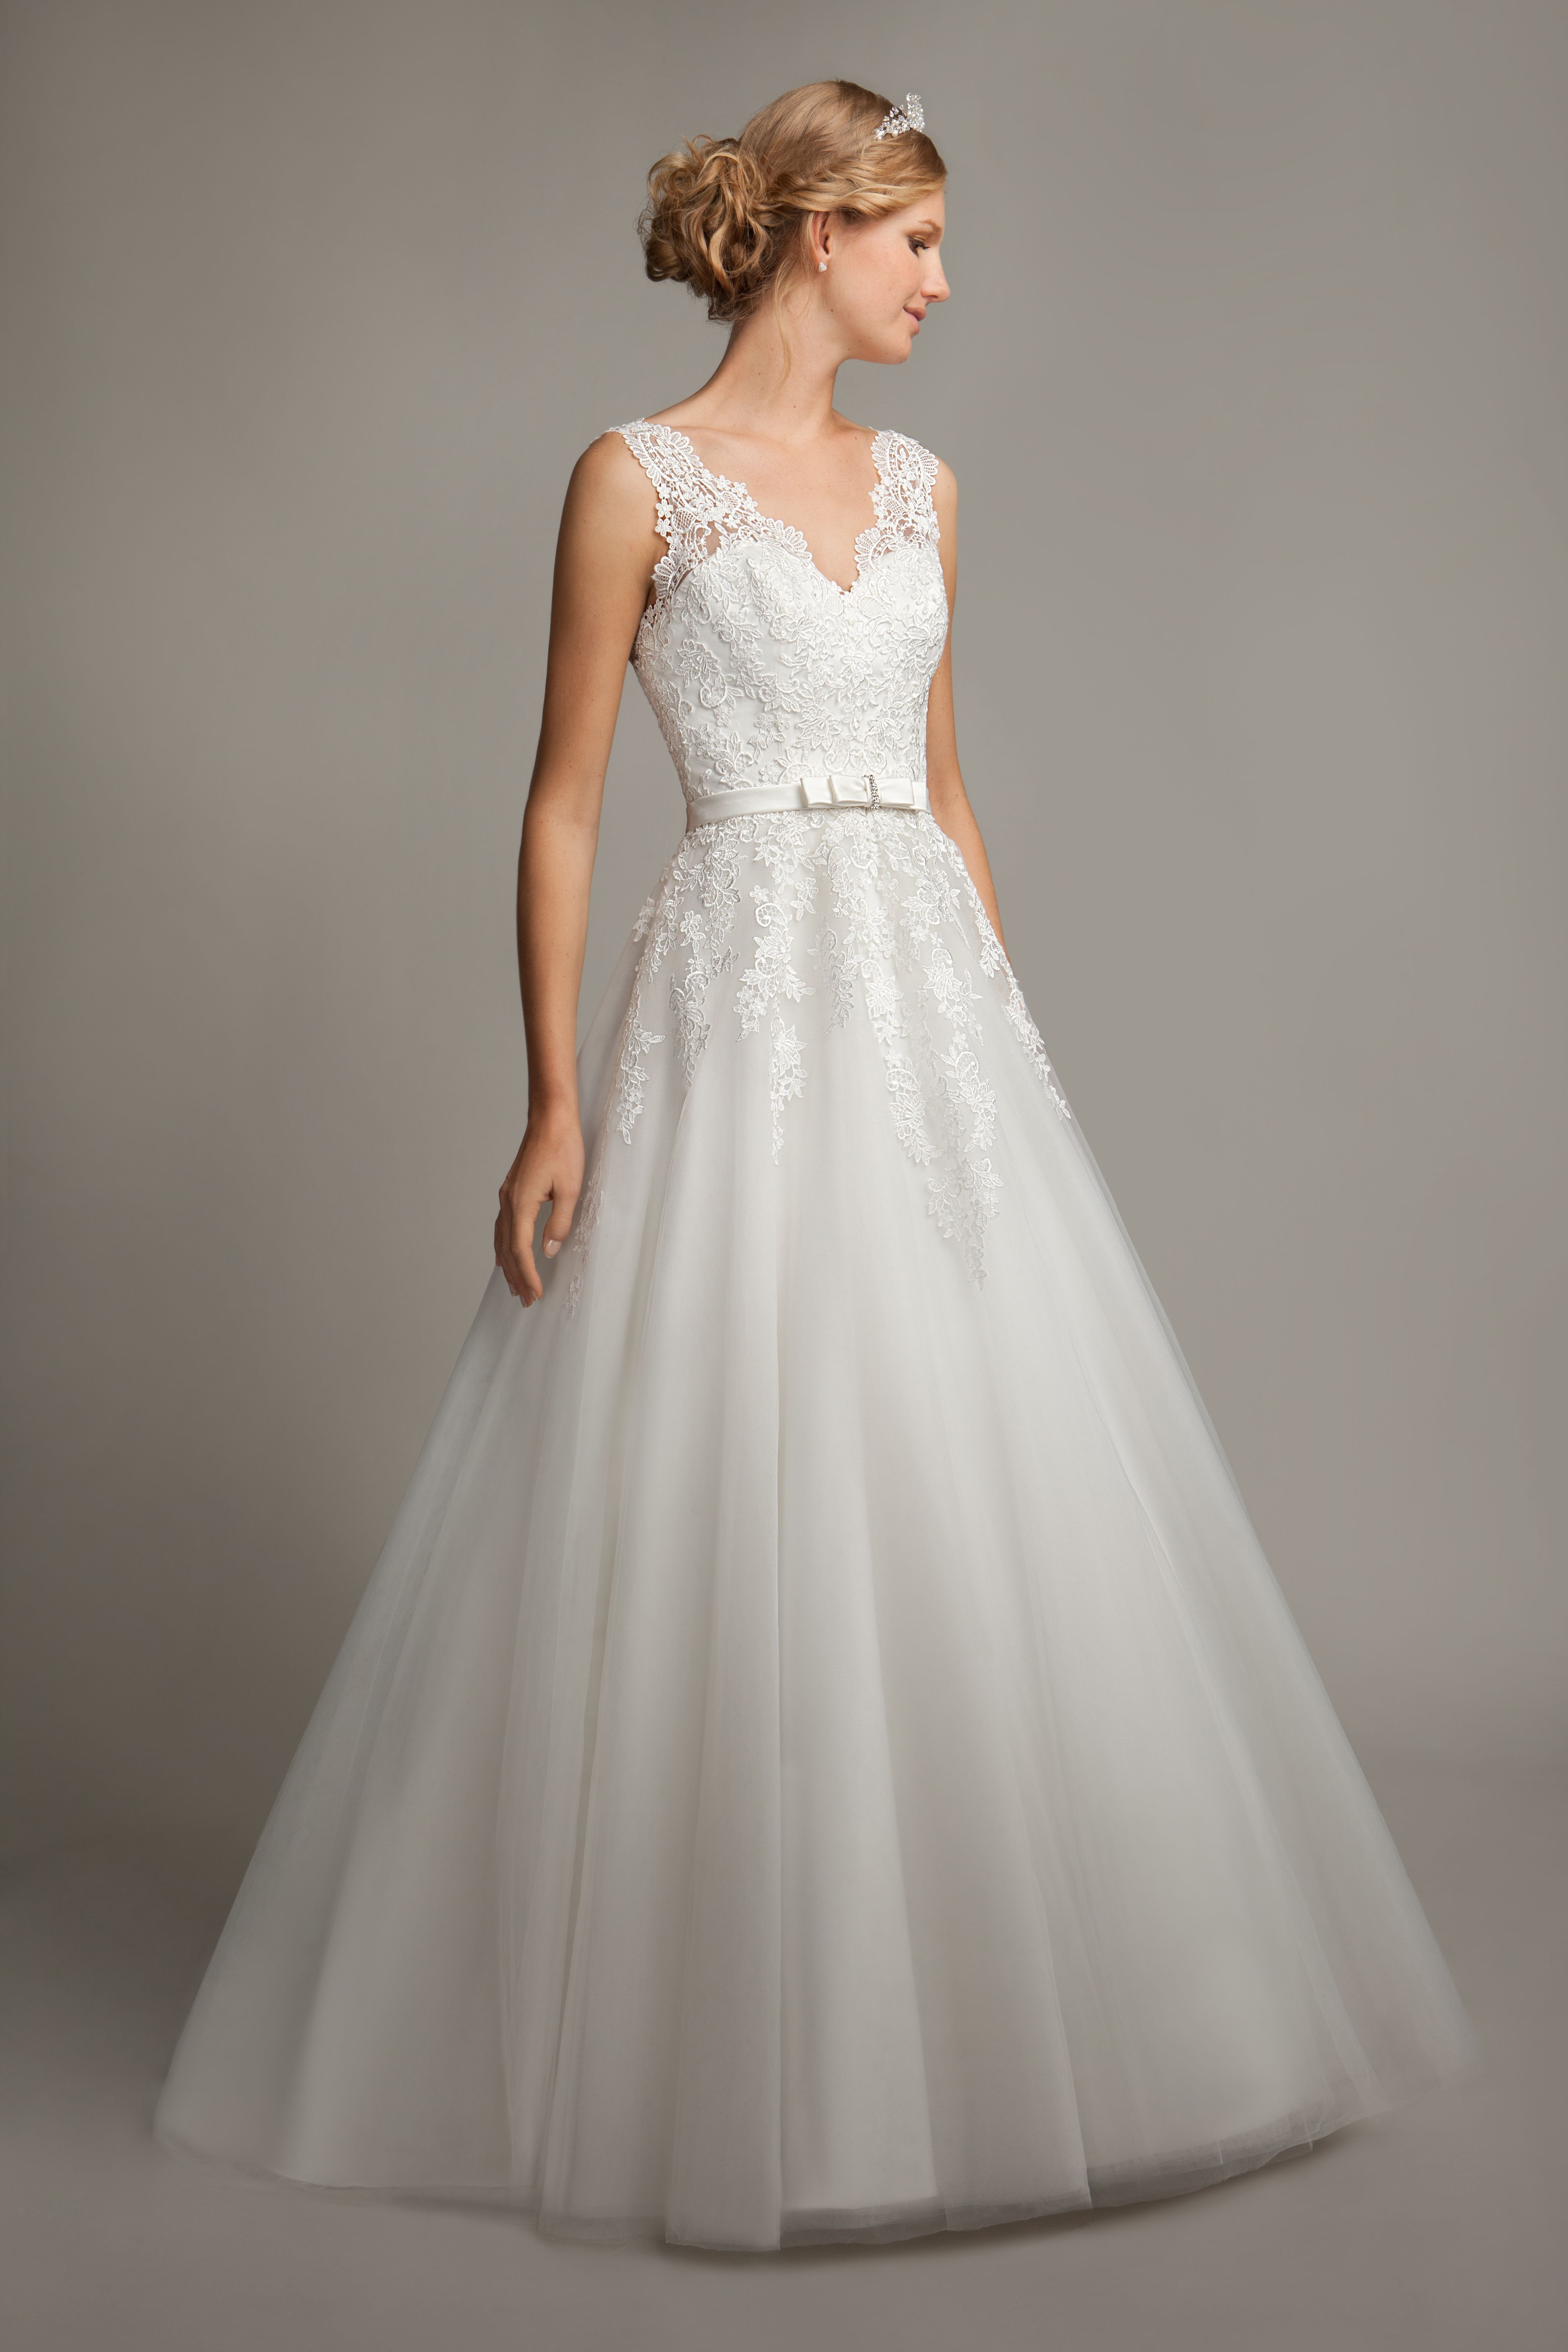 Dorable Wedding Dresses Newcastle Frieze - Wedding Plan Ideas ...